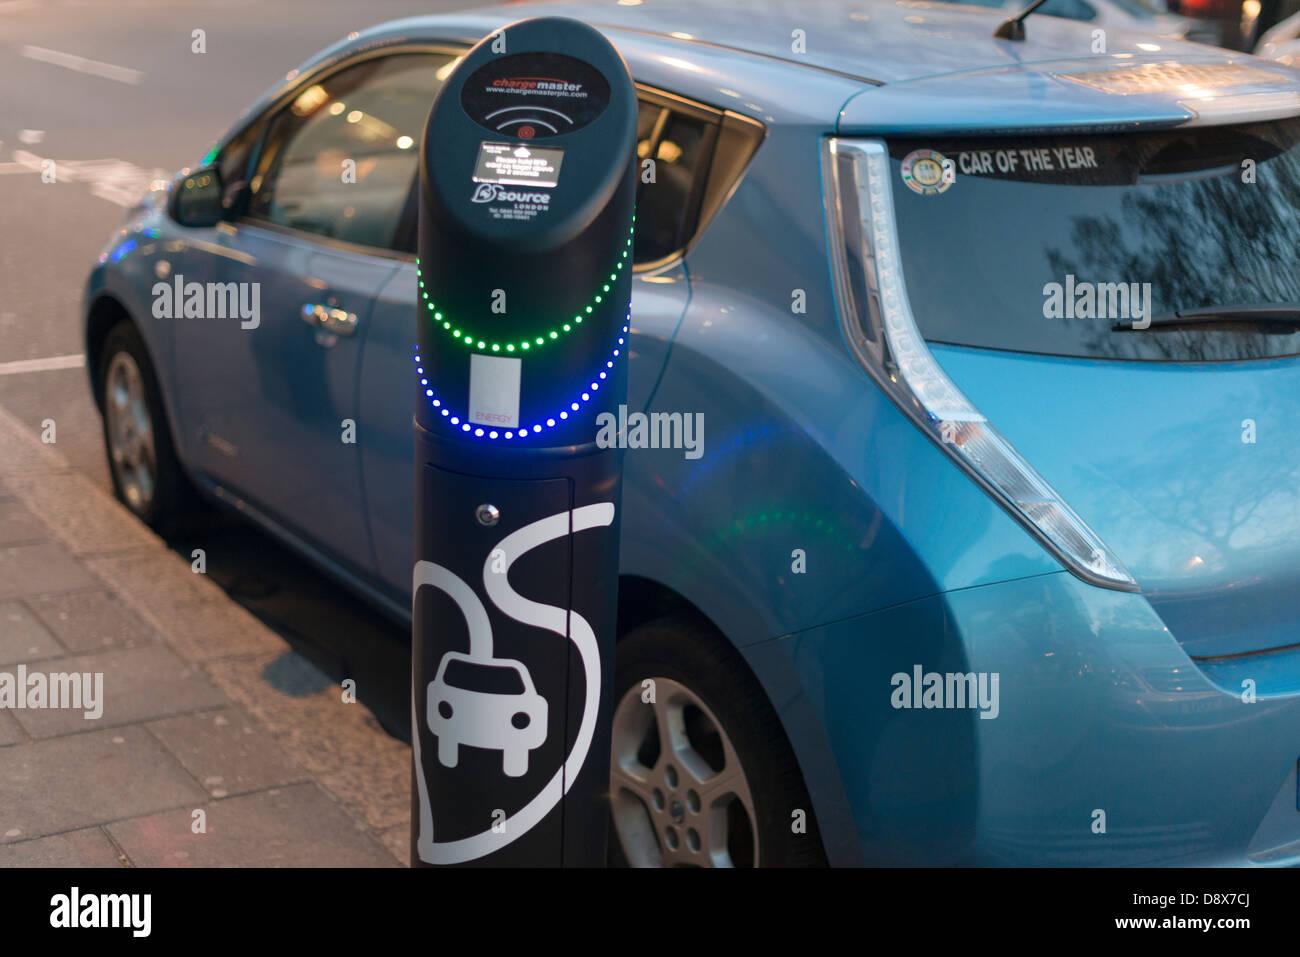 Electric vehicle on charge,London,England - Stock Image